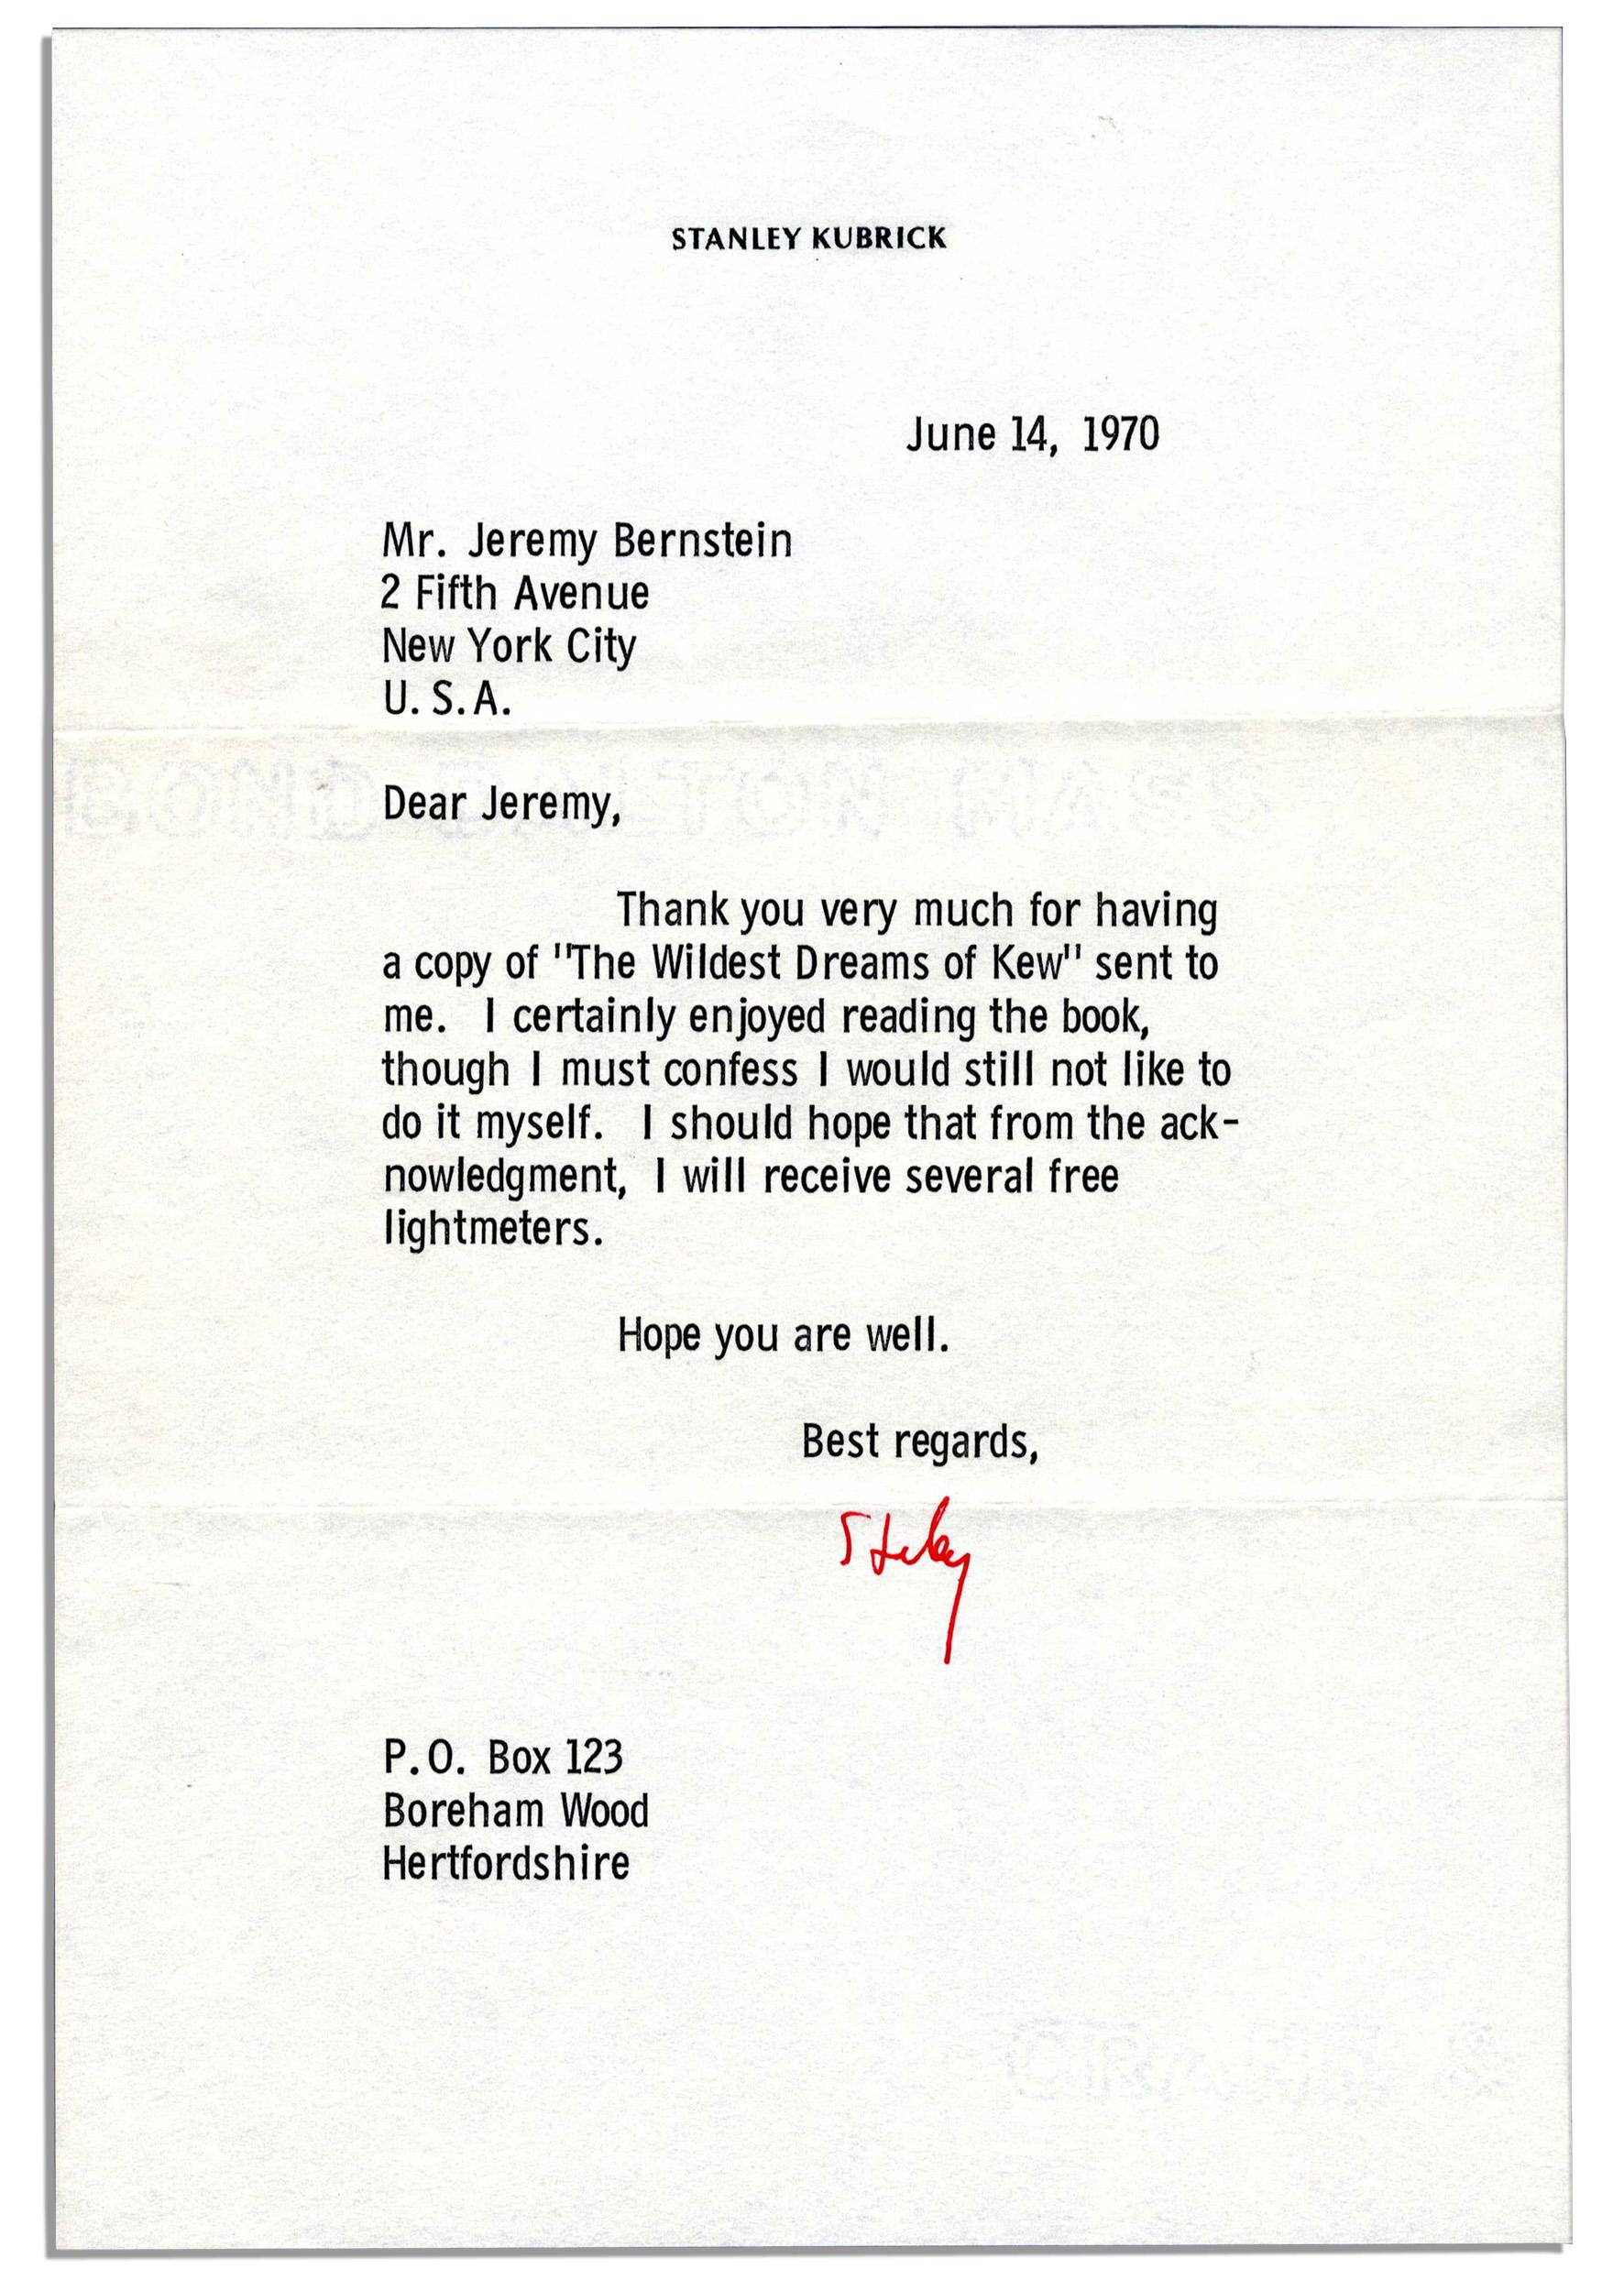 Stanley Kubrick autograph